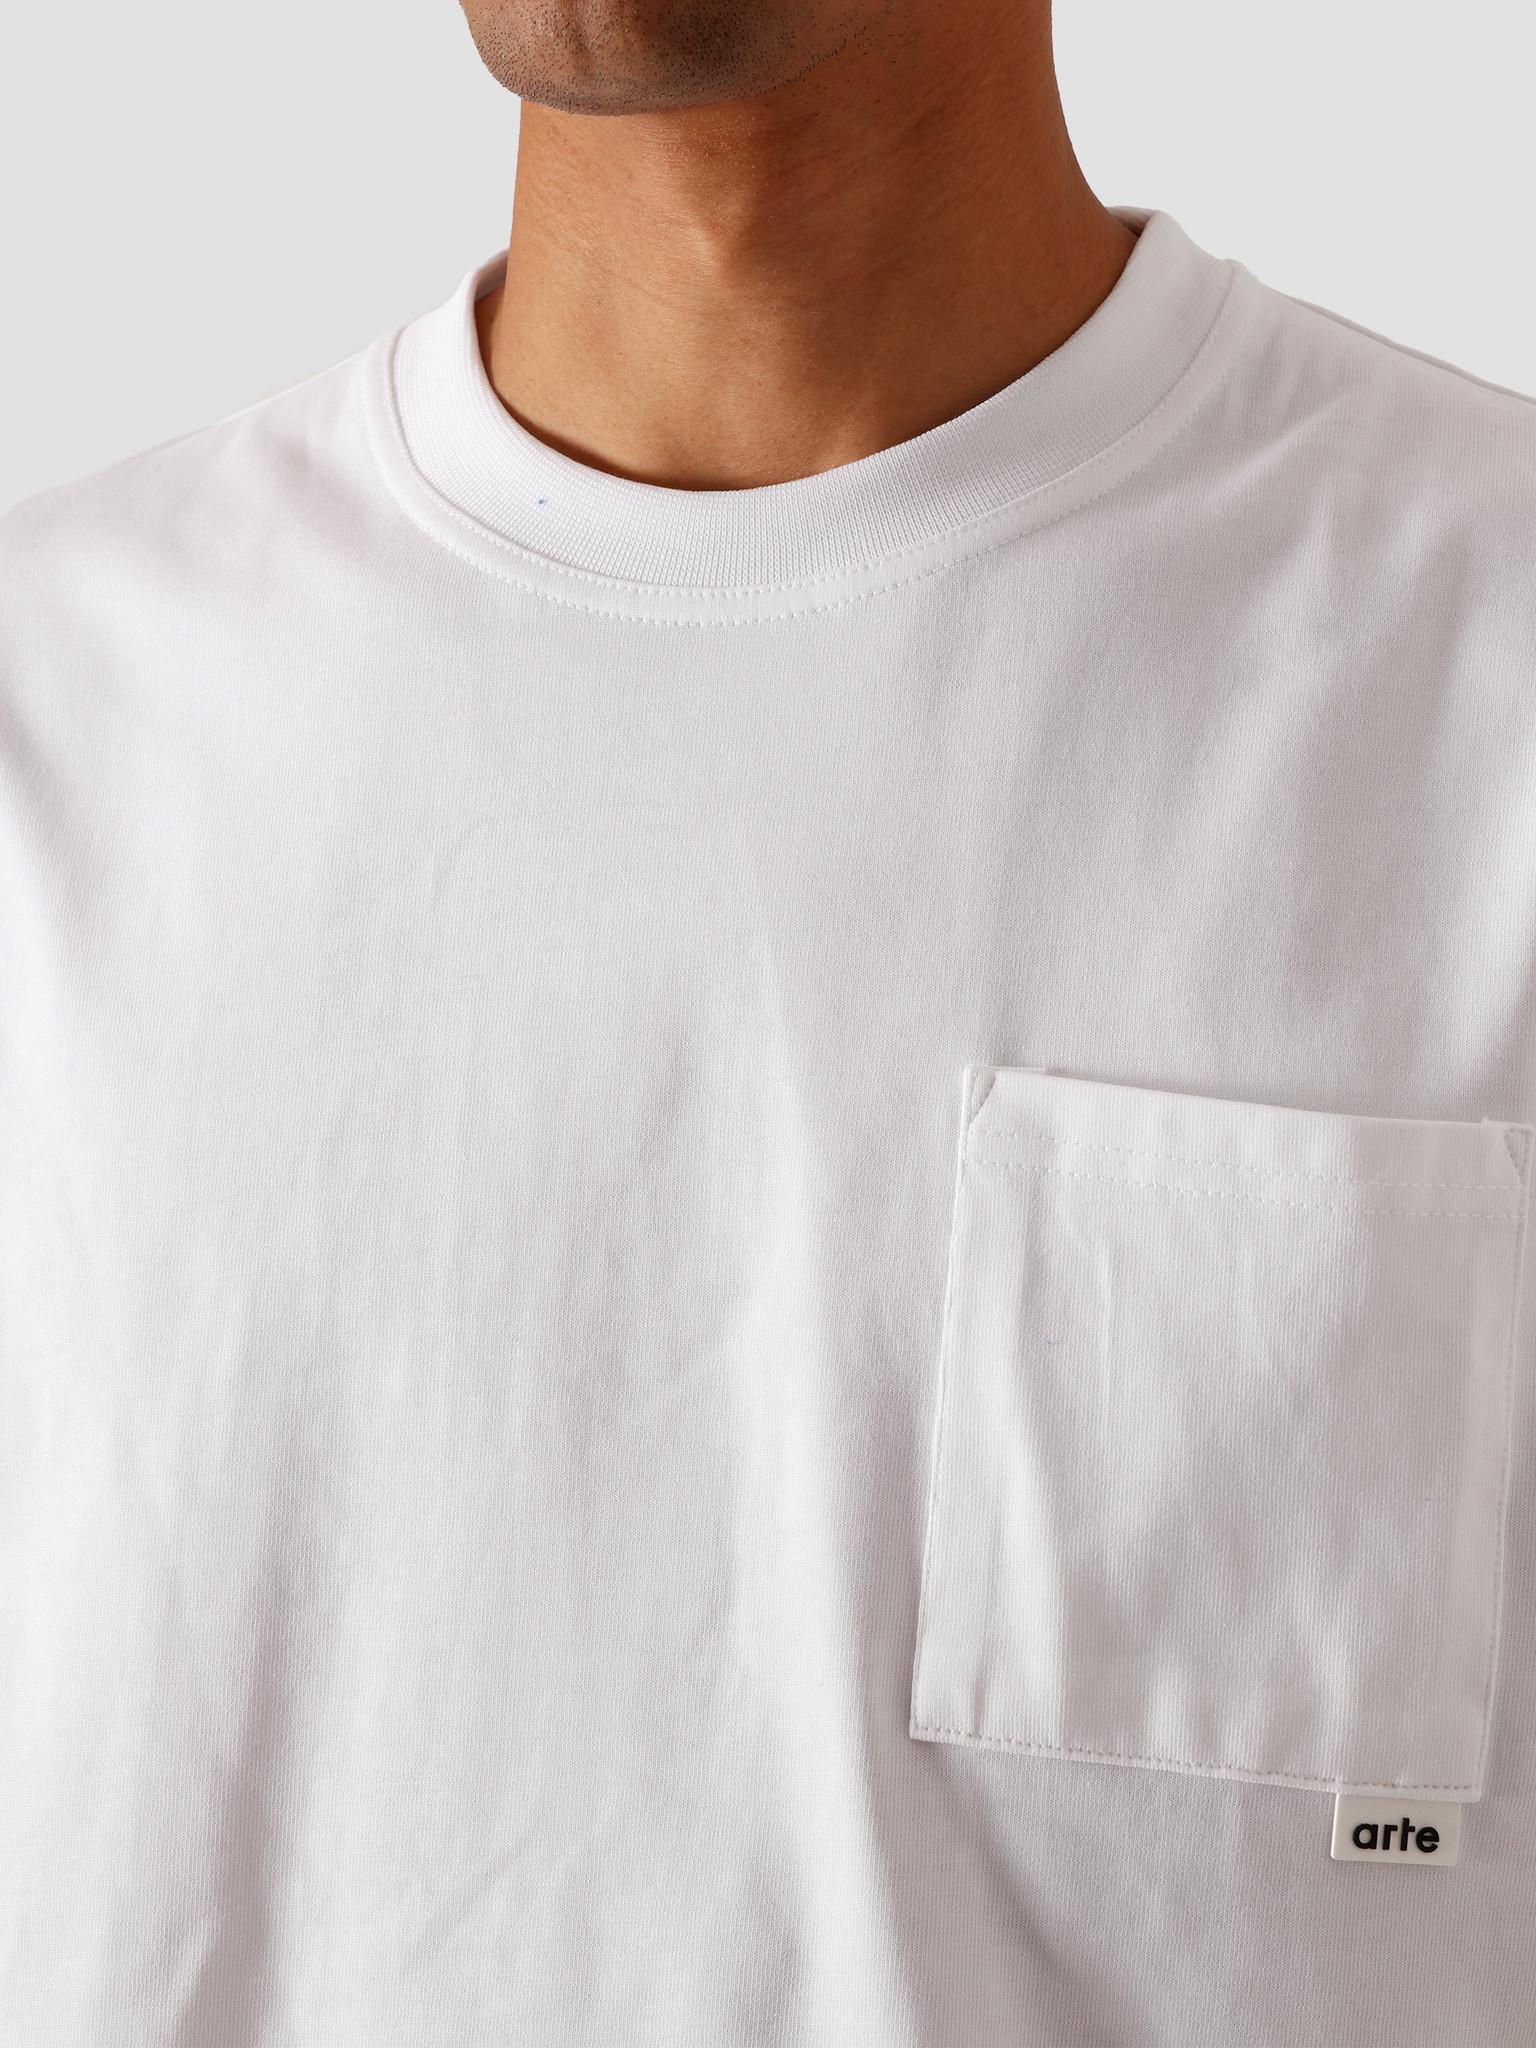 Arte Antwerp Arte Antwerp Tibo Pocket T-Shirt White AW20-004T